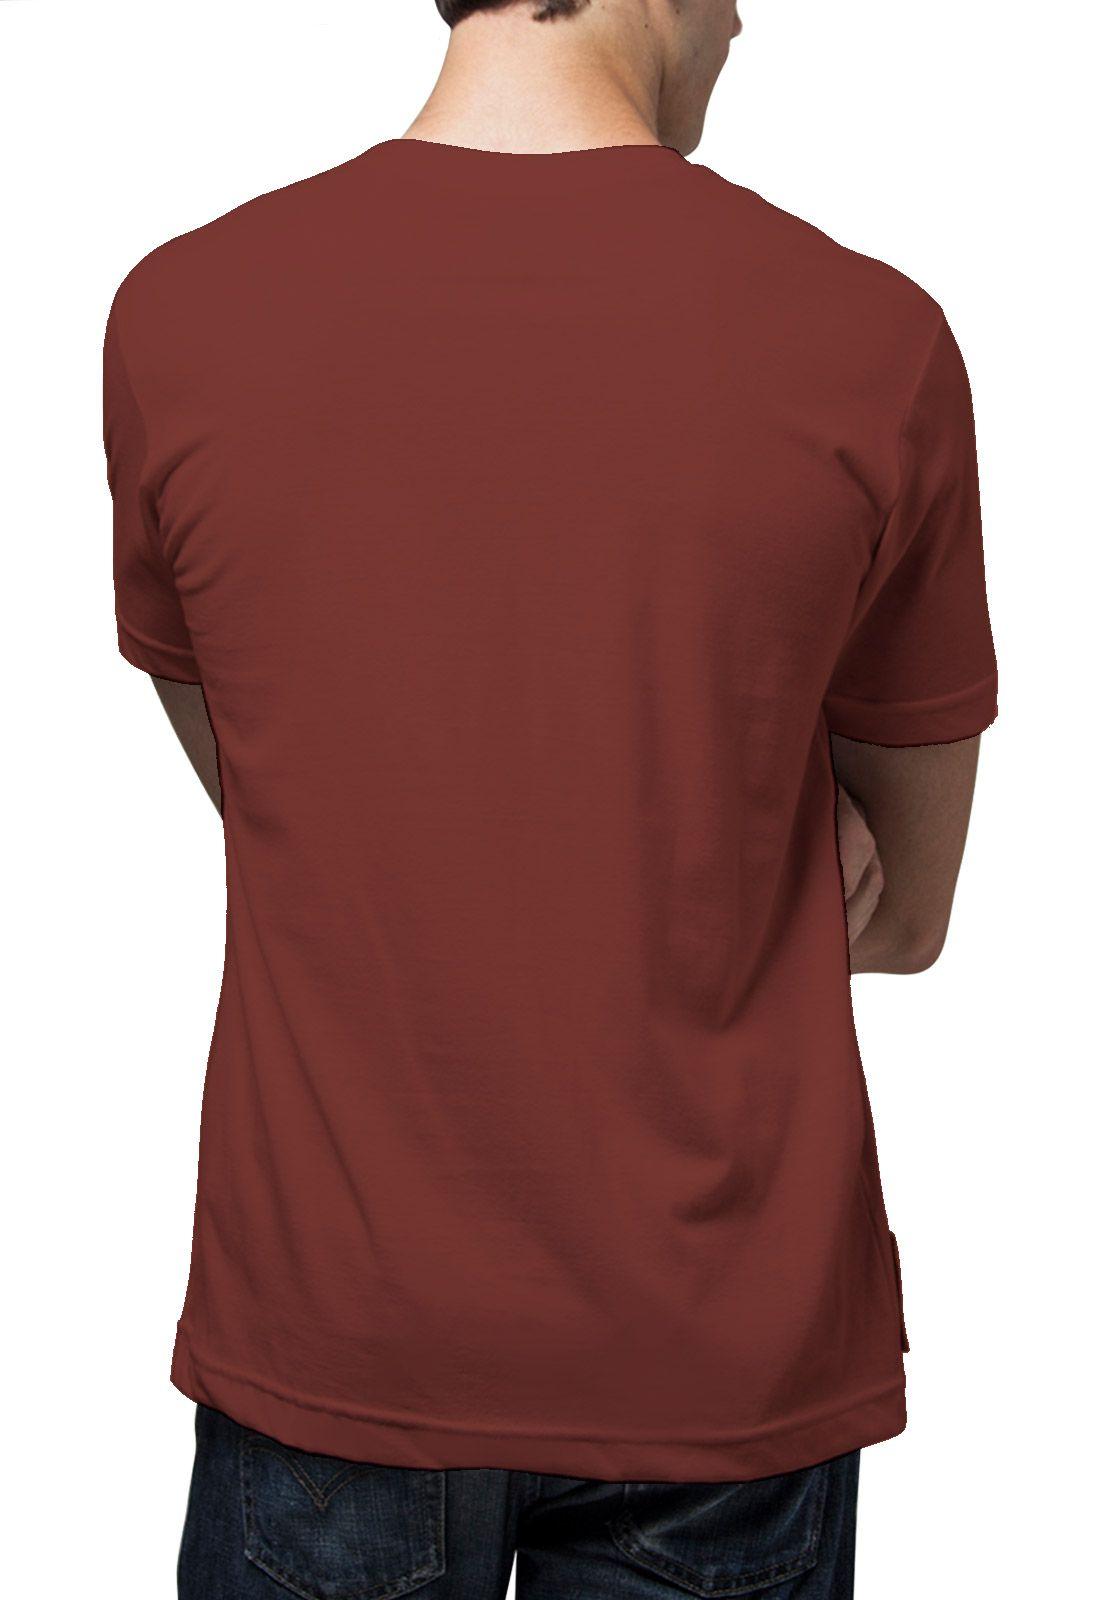 Camiseta Amazônia Since 2006 - Vinho